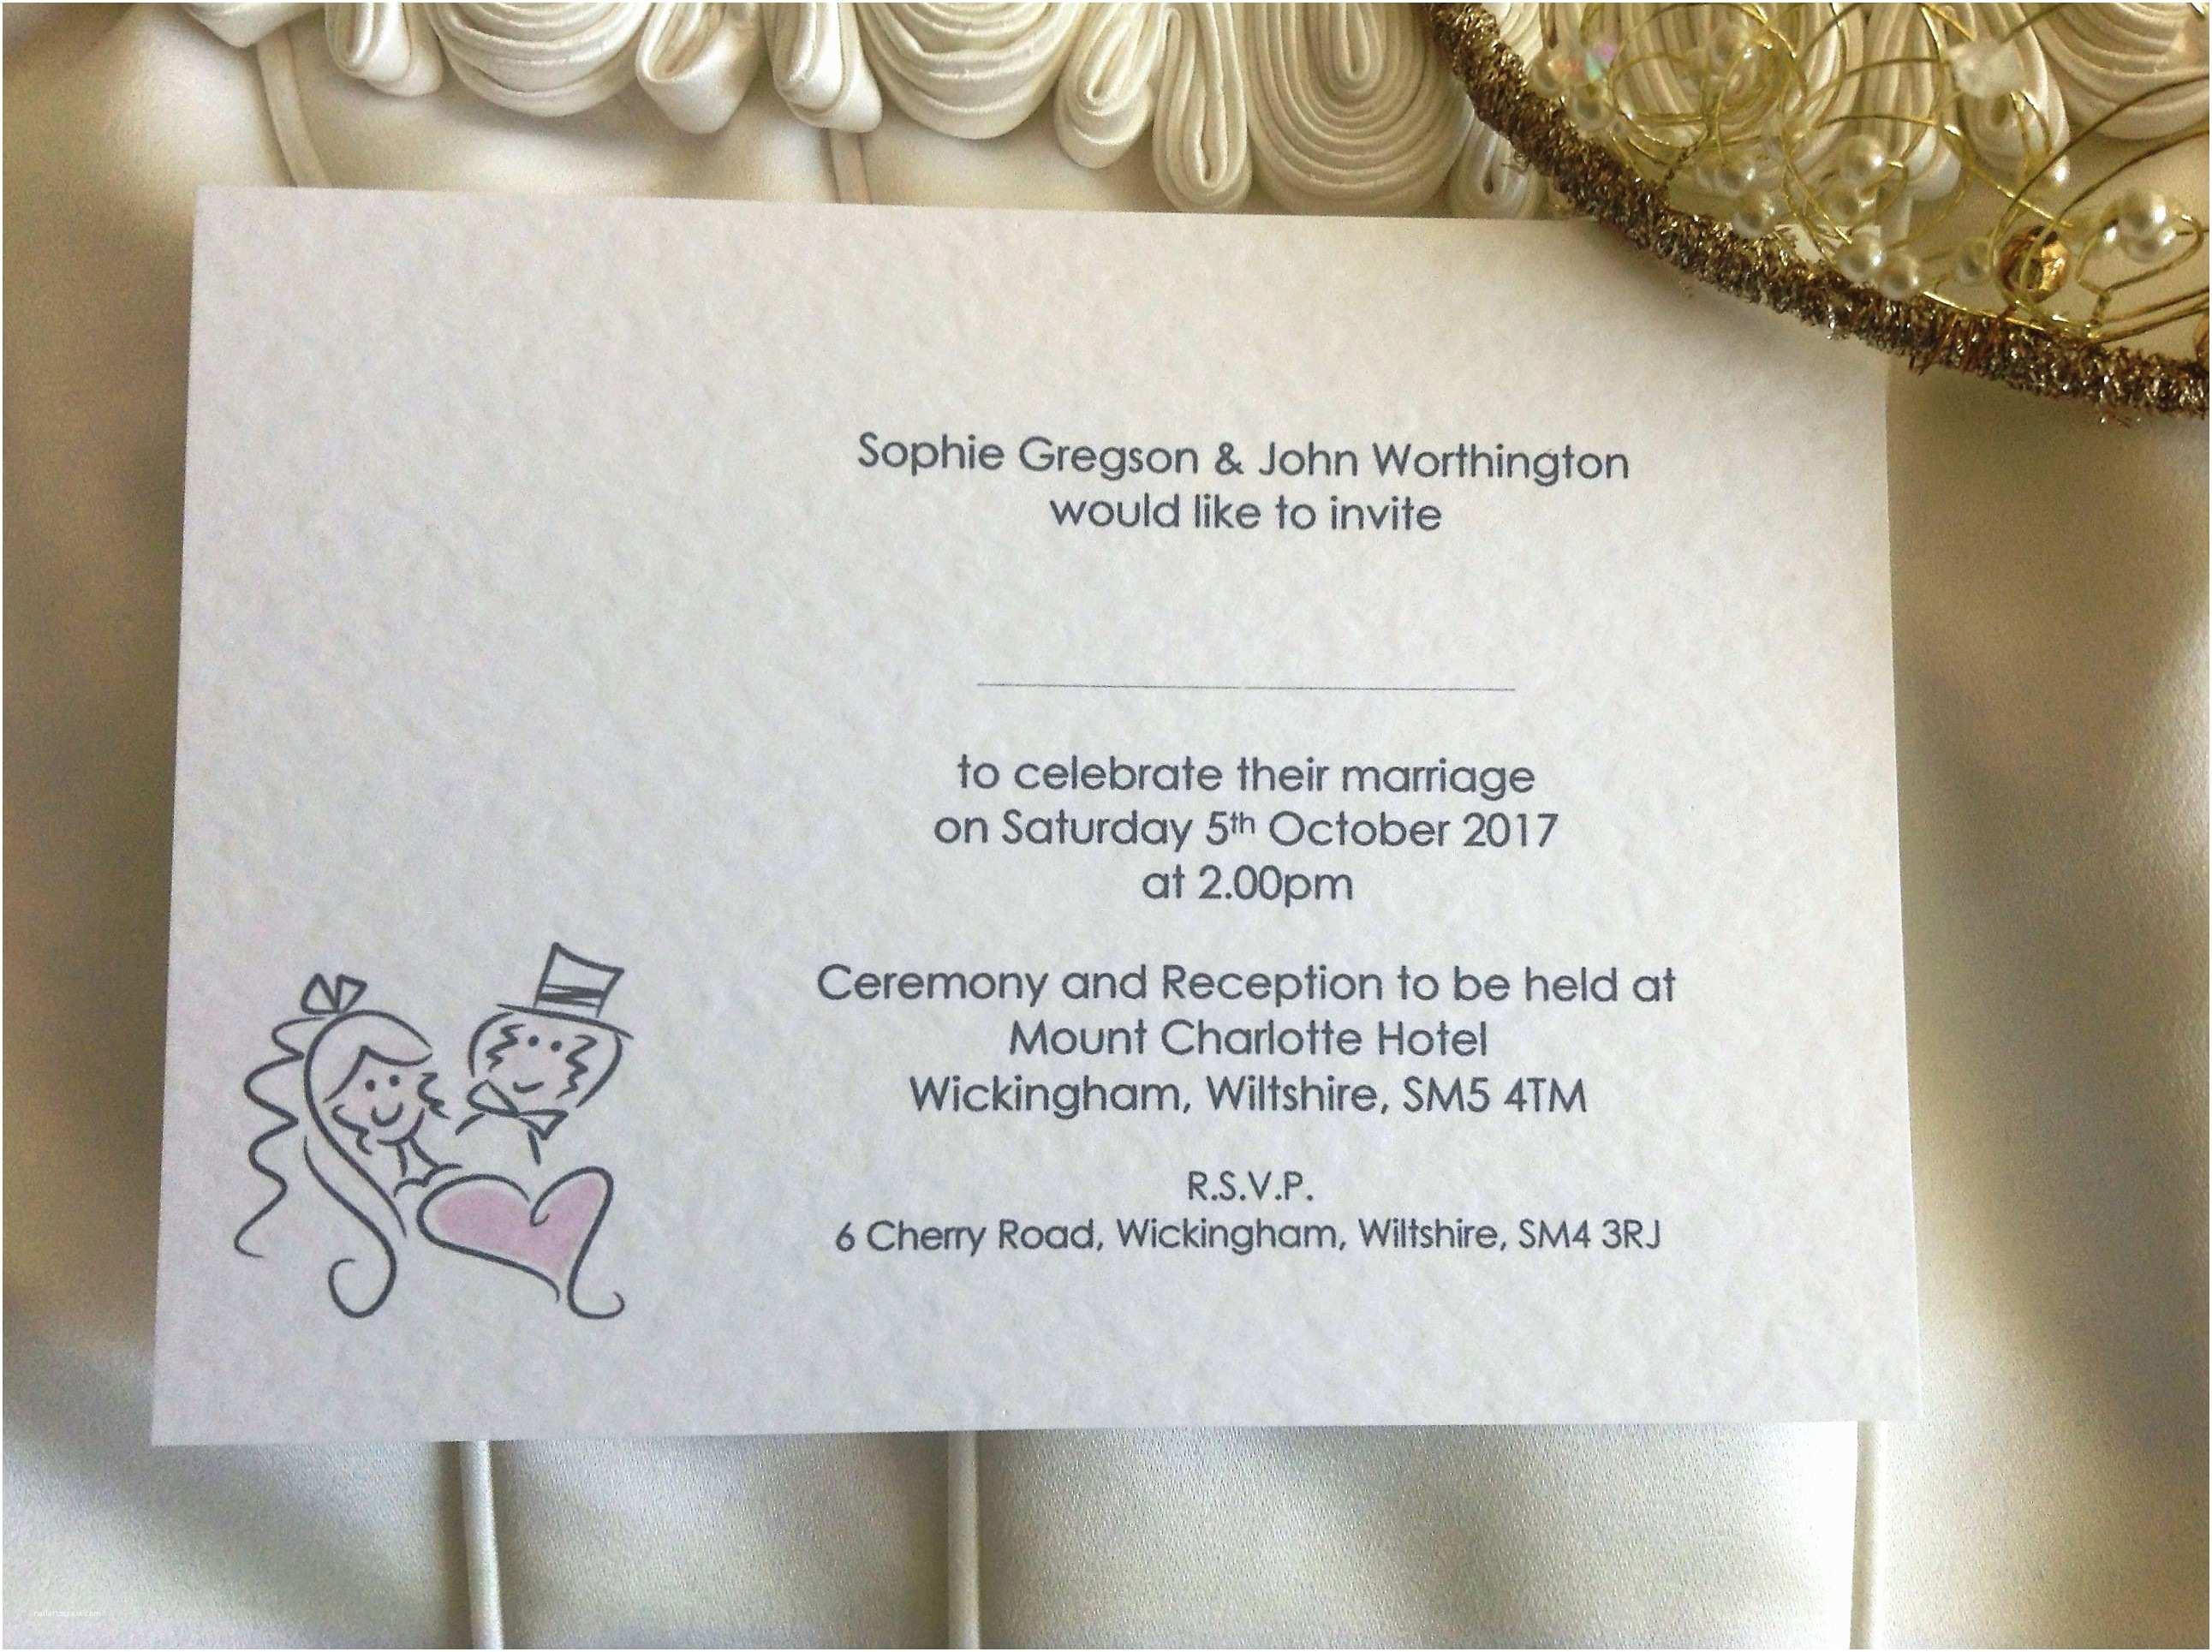 Bride and Groom Wedding Invitations Bride and Groom Postcard Wedding Invitations